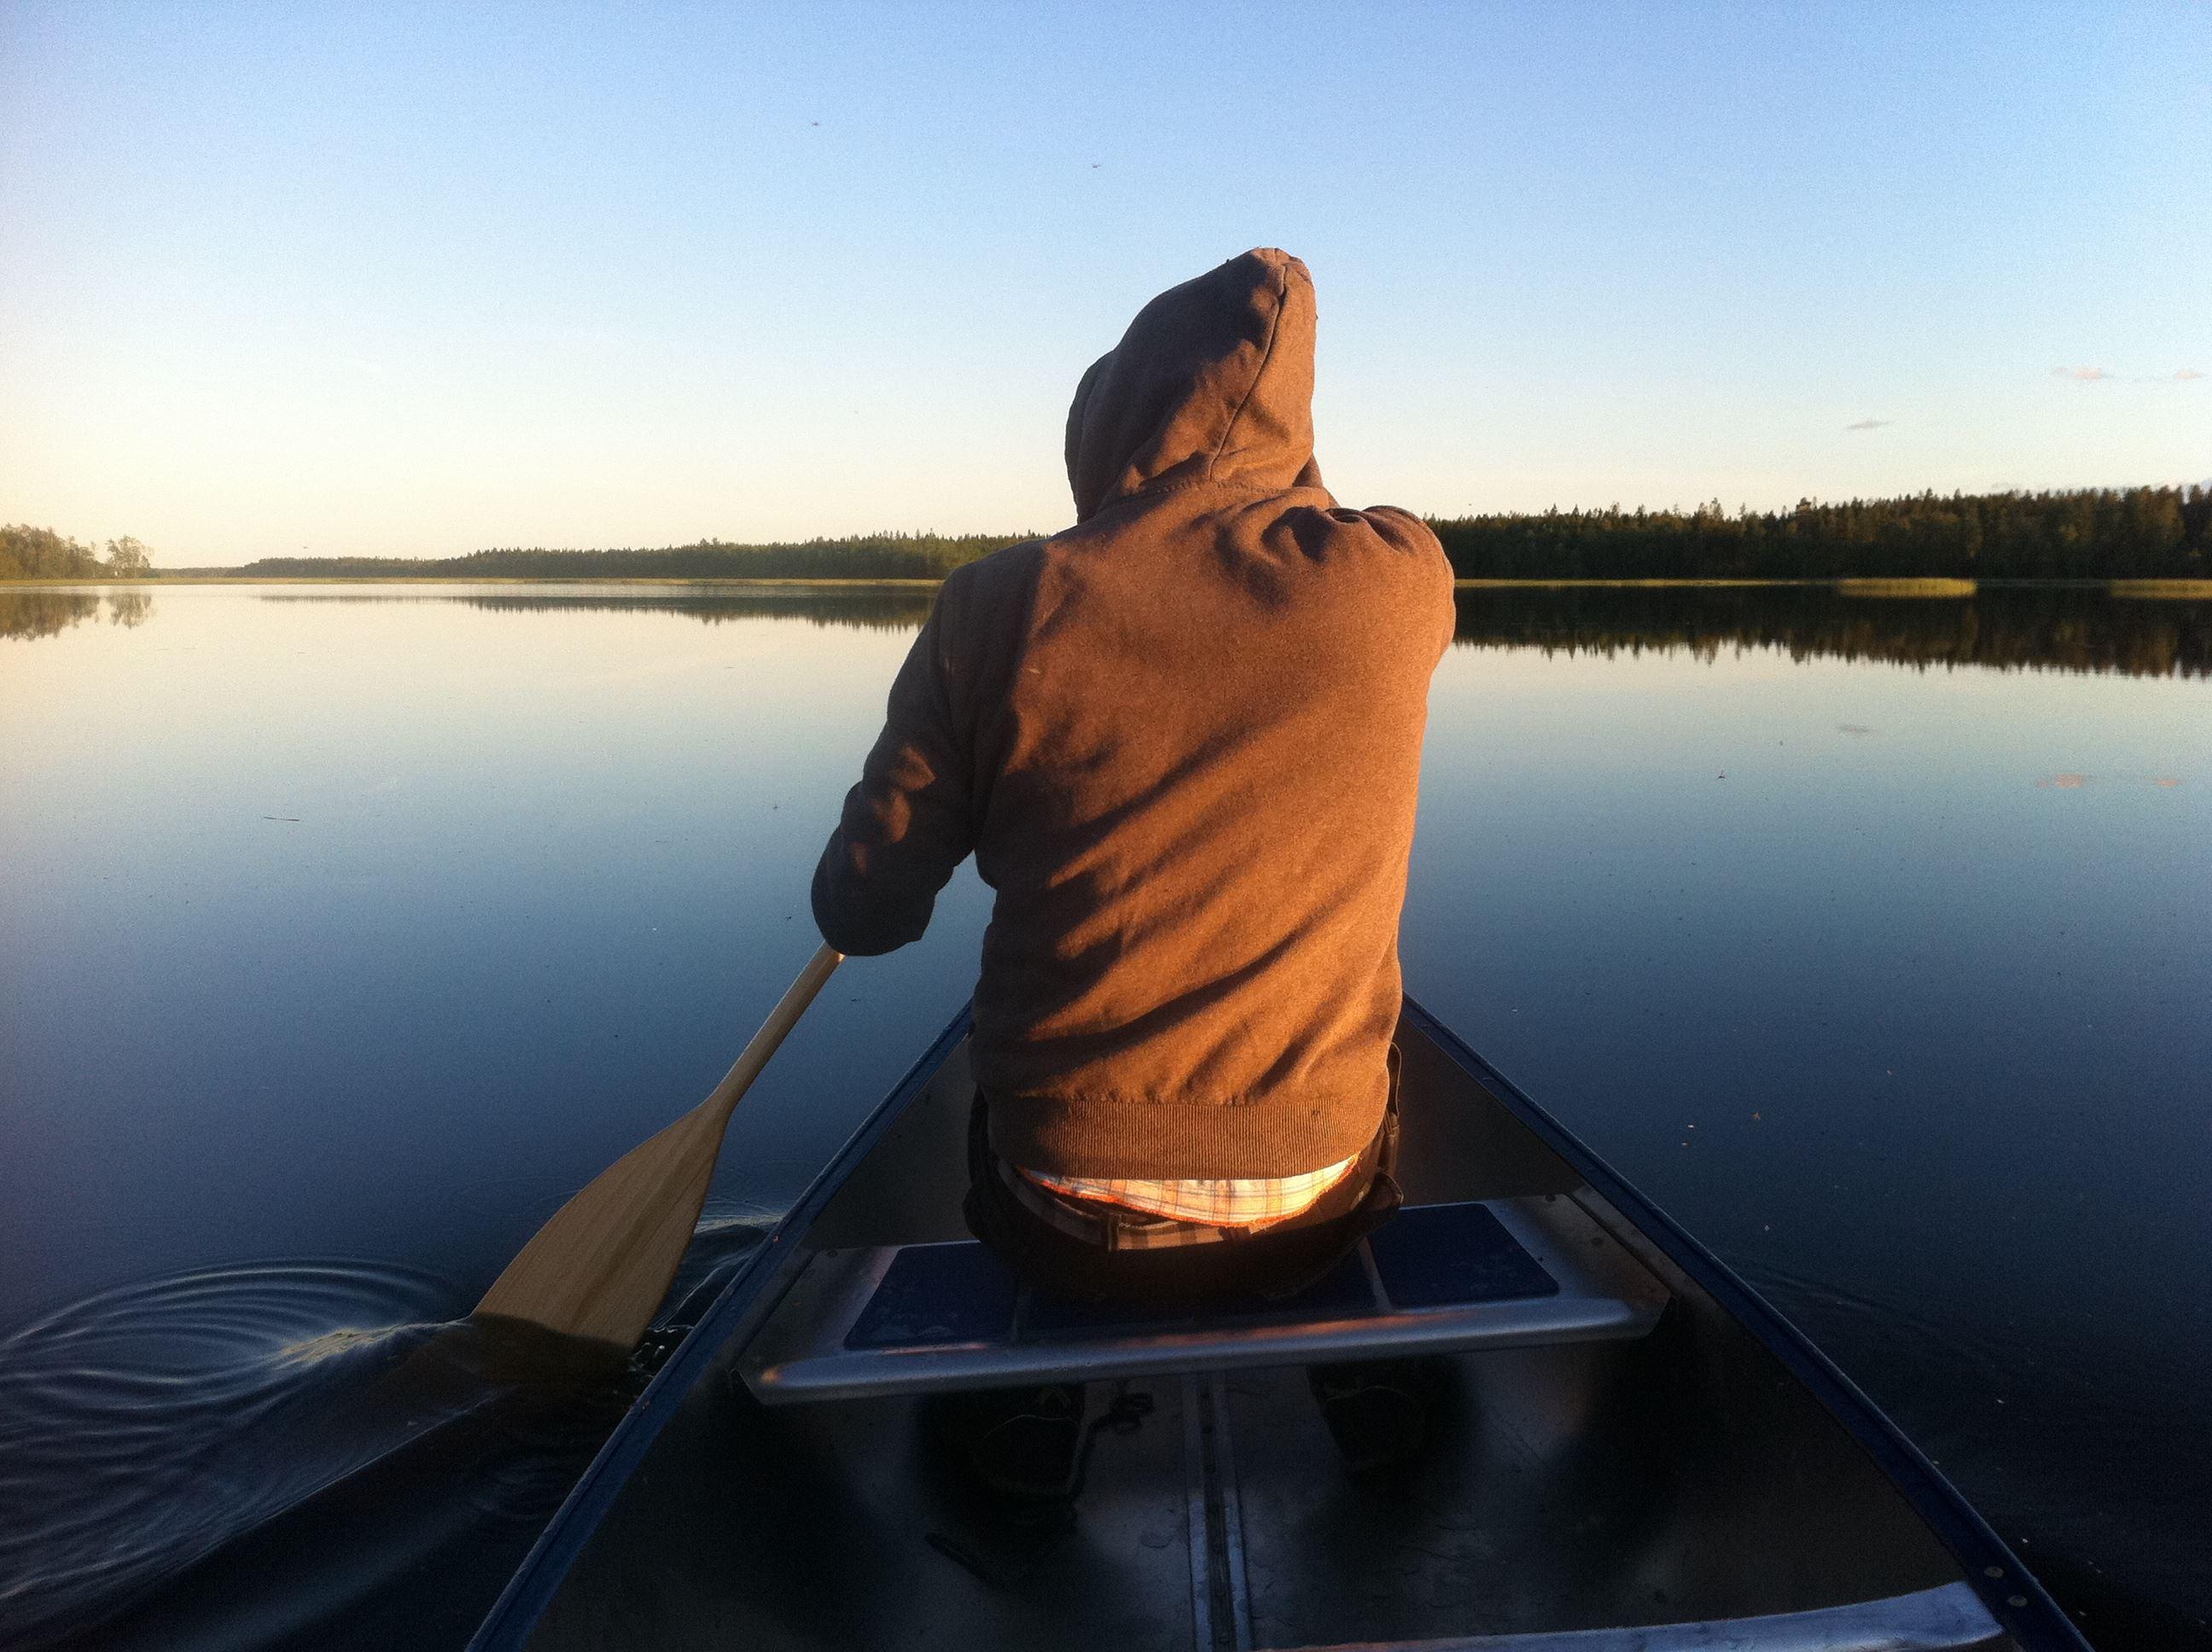 Örjan Forsberg, Canoe paddling with UmeNatur